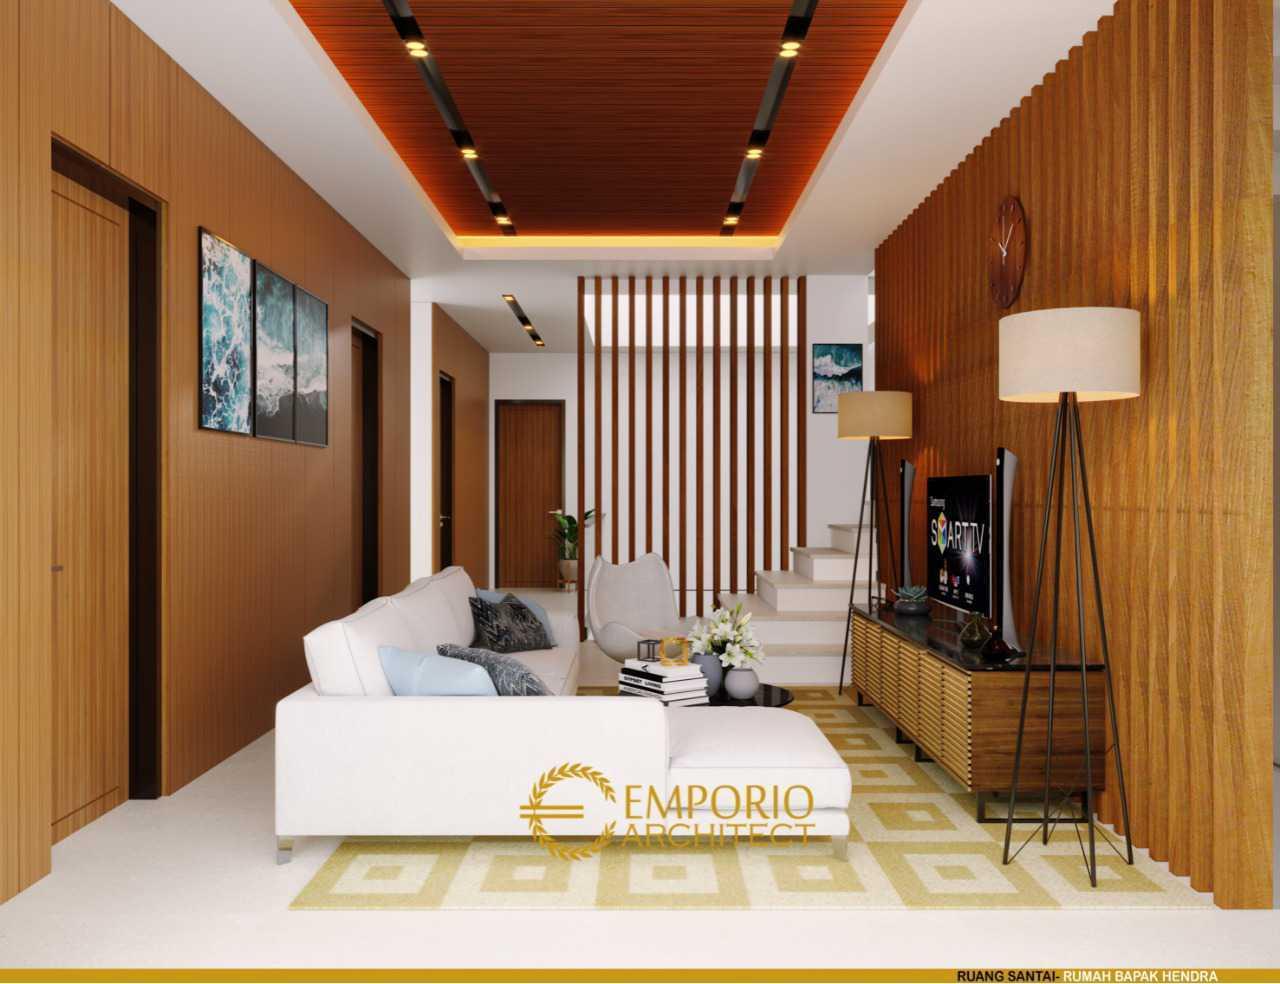 Emporio Architect Jasa Arsitek Jawa Timur Desain Rumah Modern Tropis 719 @ Kediri, Jawa Timur Kediri, Jawa Timur, Indonesia Kediri, Jawa Timur, Indonesia Emporio-Architect-Jasa-Arsitek-Jawa-Timur-Desain-Rumah-Modern-Tropis-719-Kediri-Jawa-Timur  84415